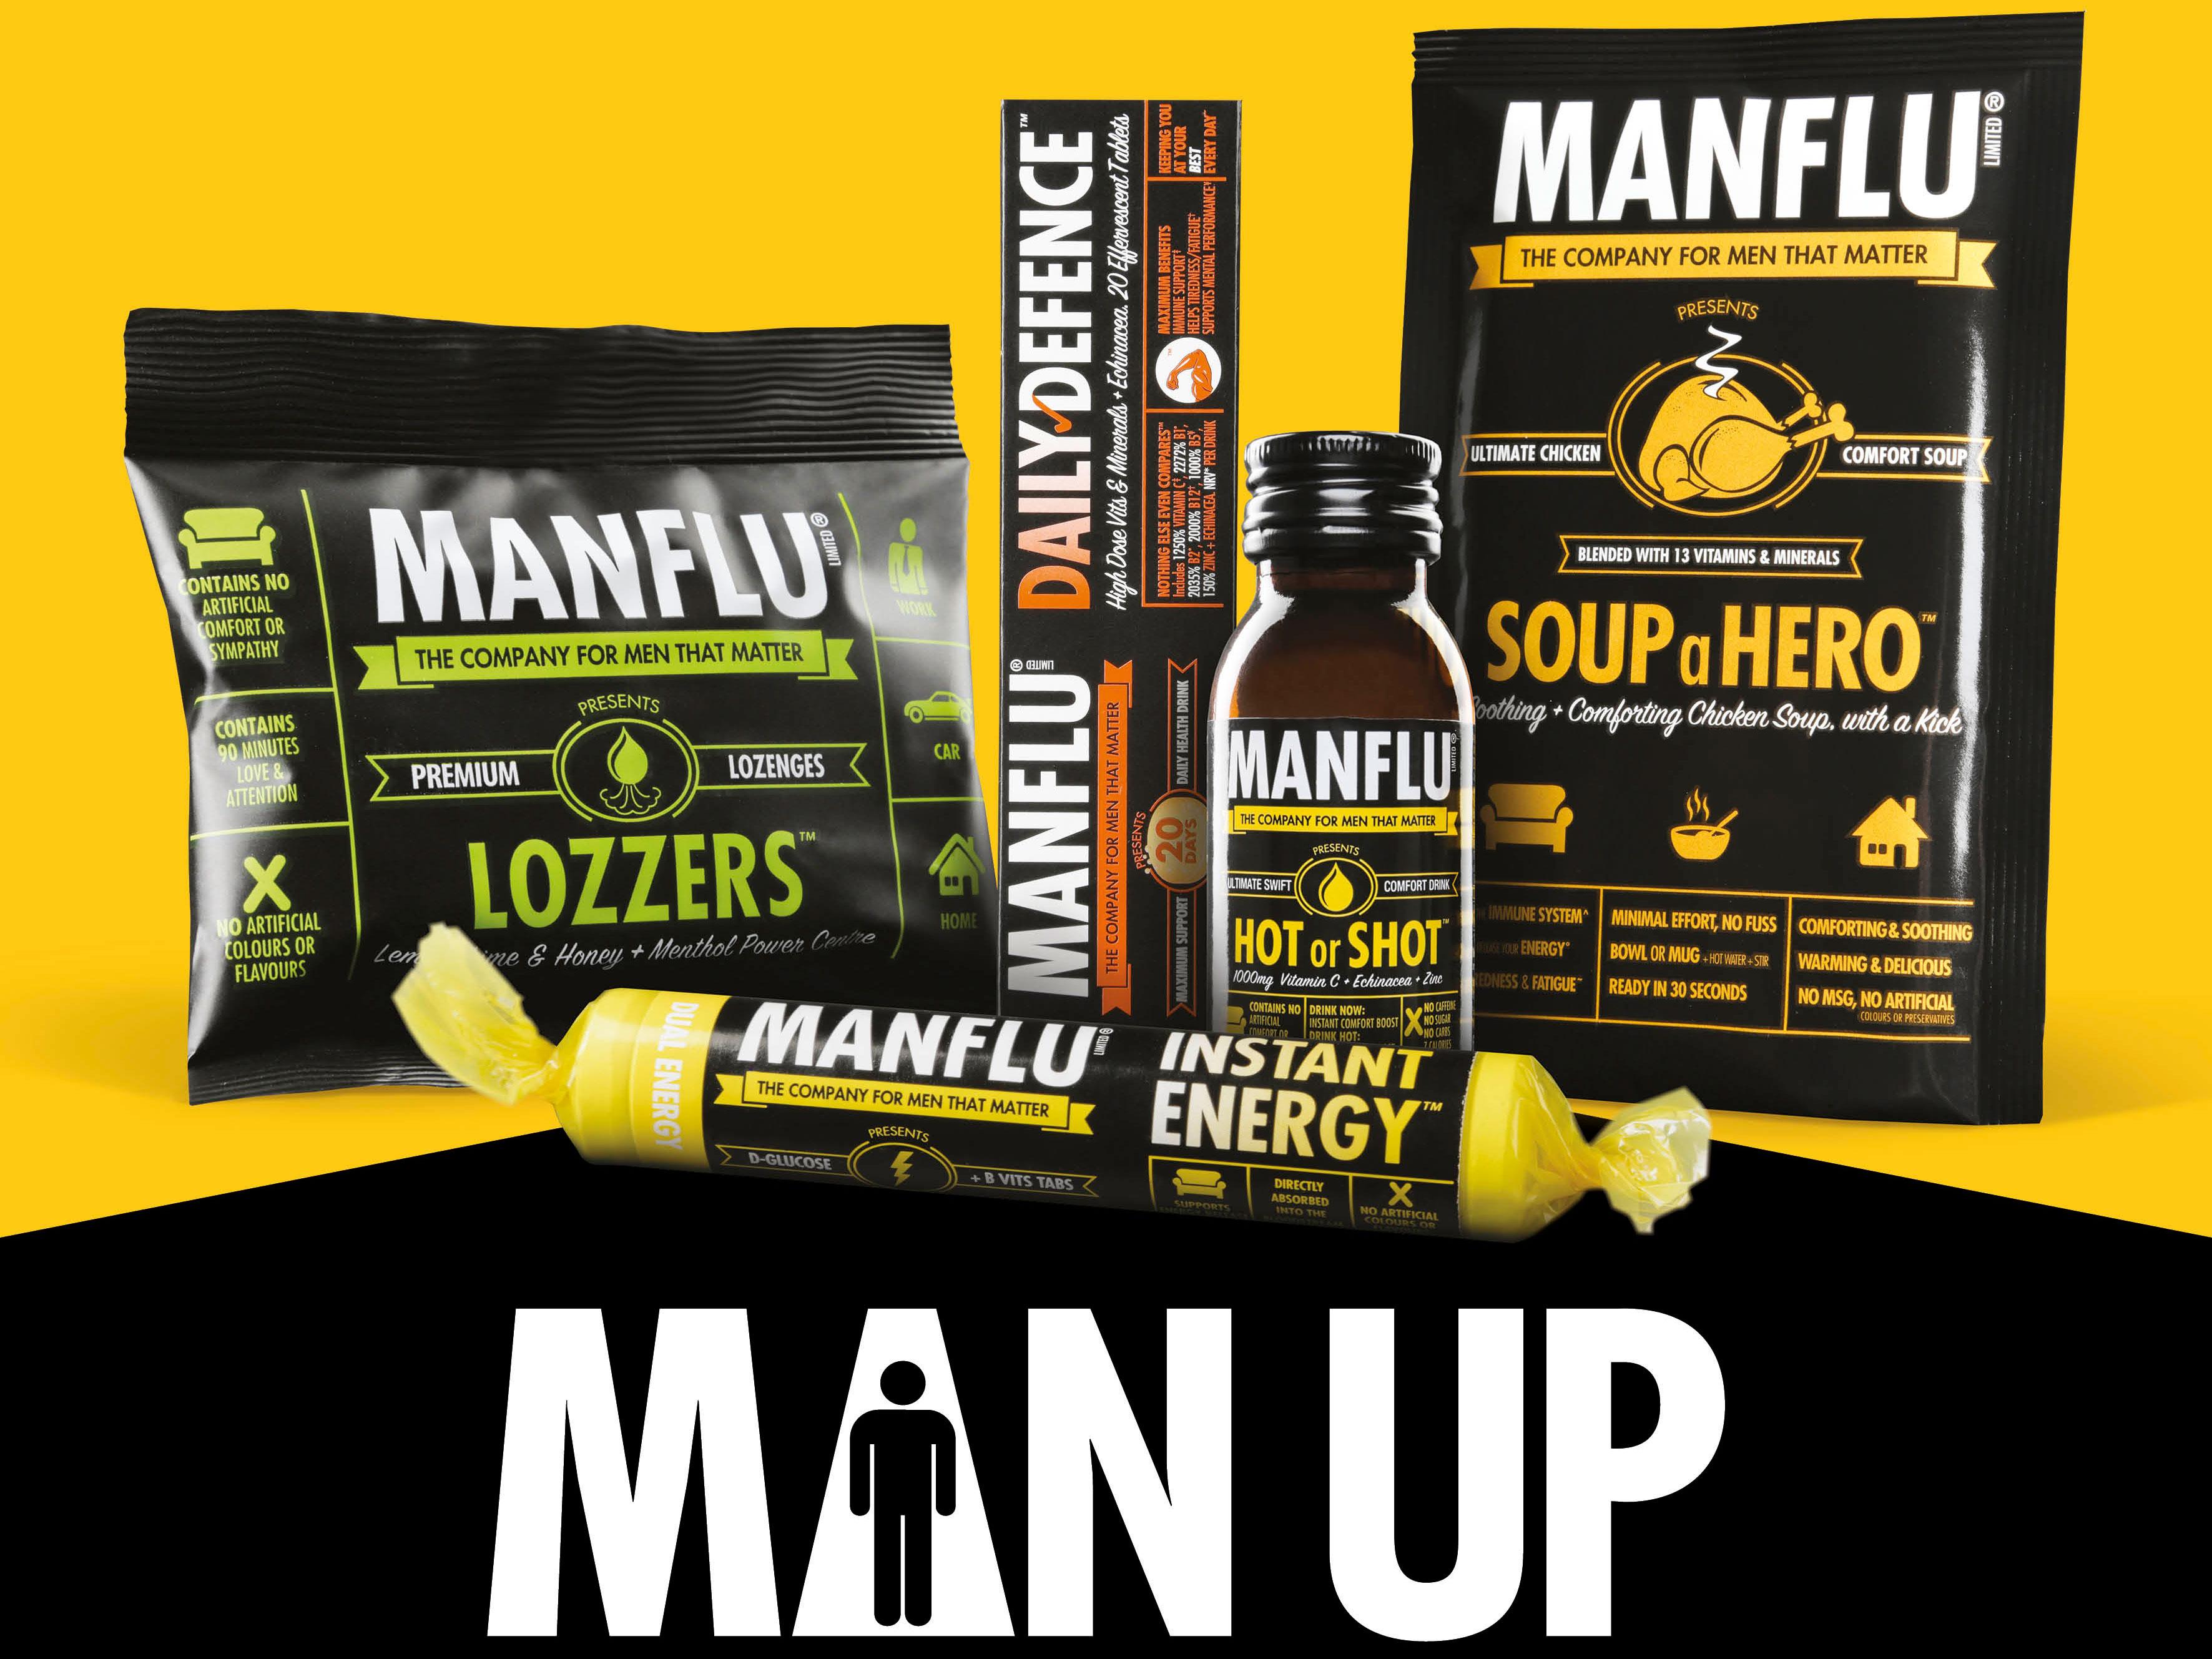 MANFLU pick Matta to launch outdoor creative